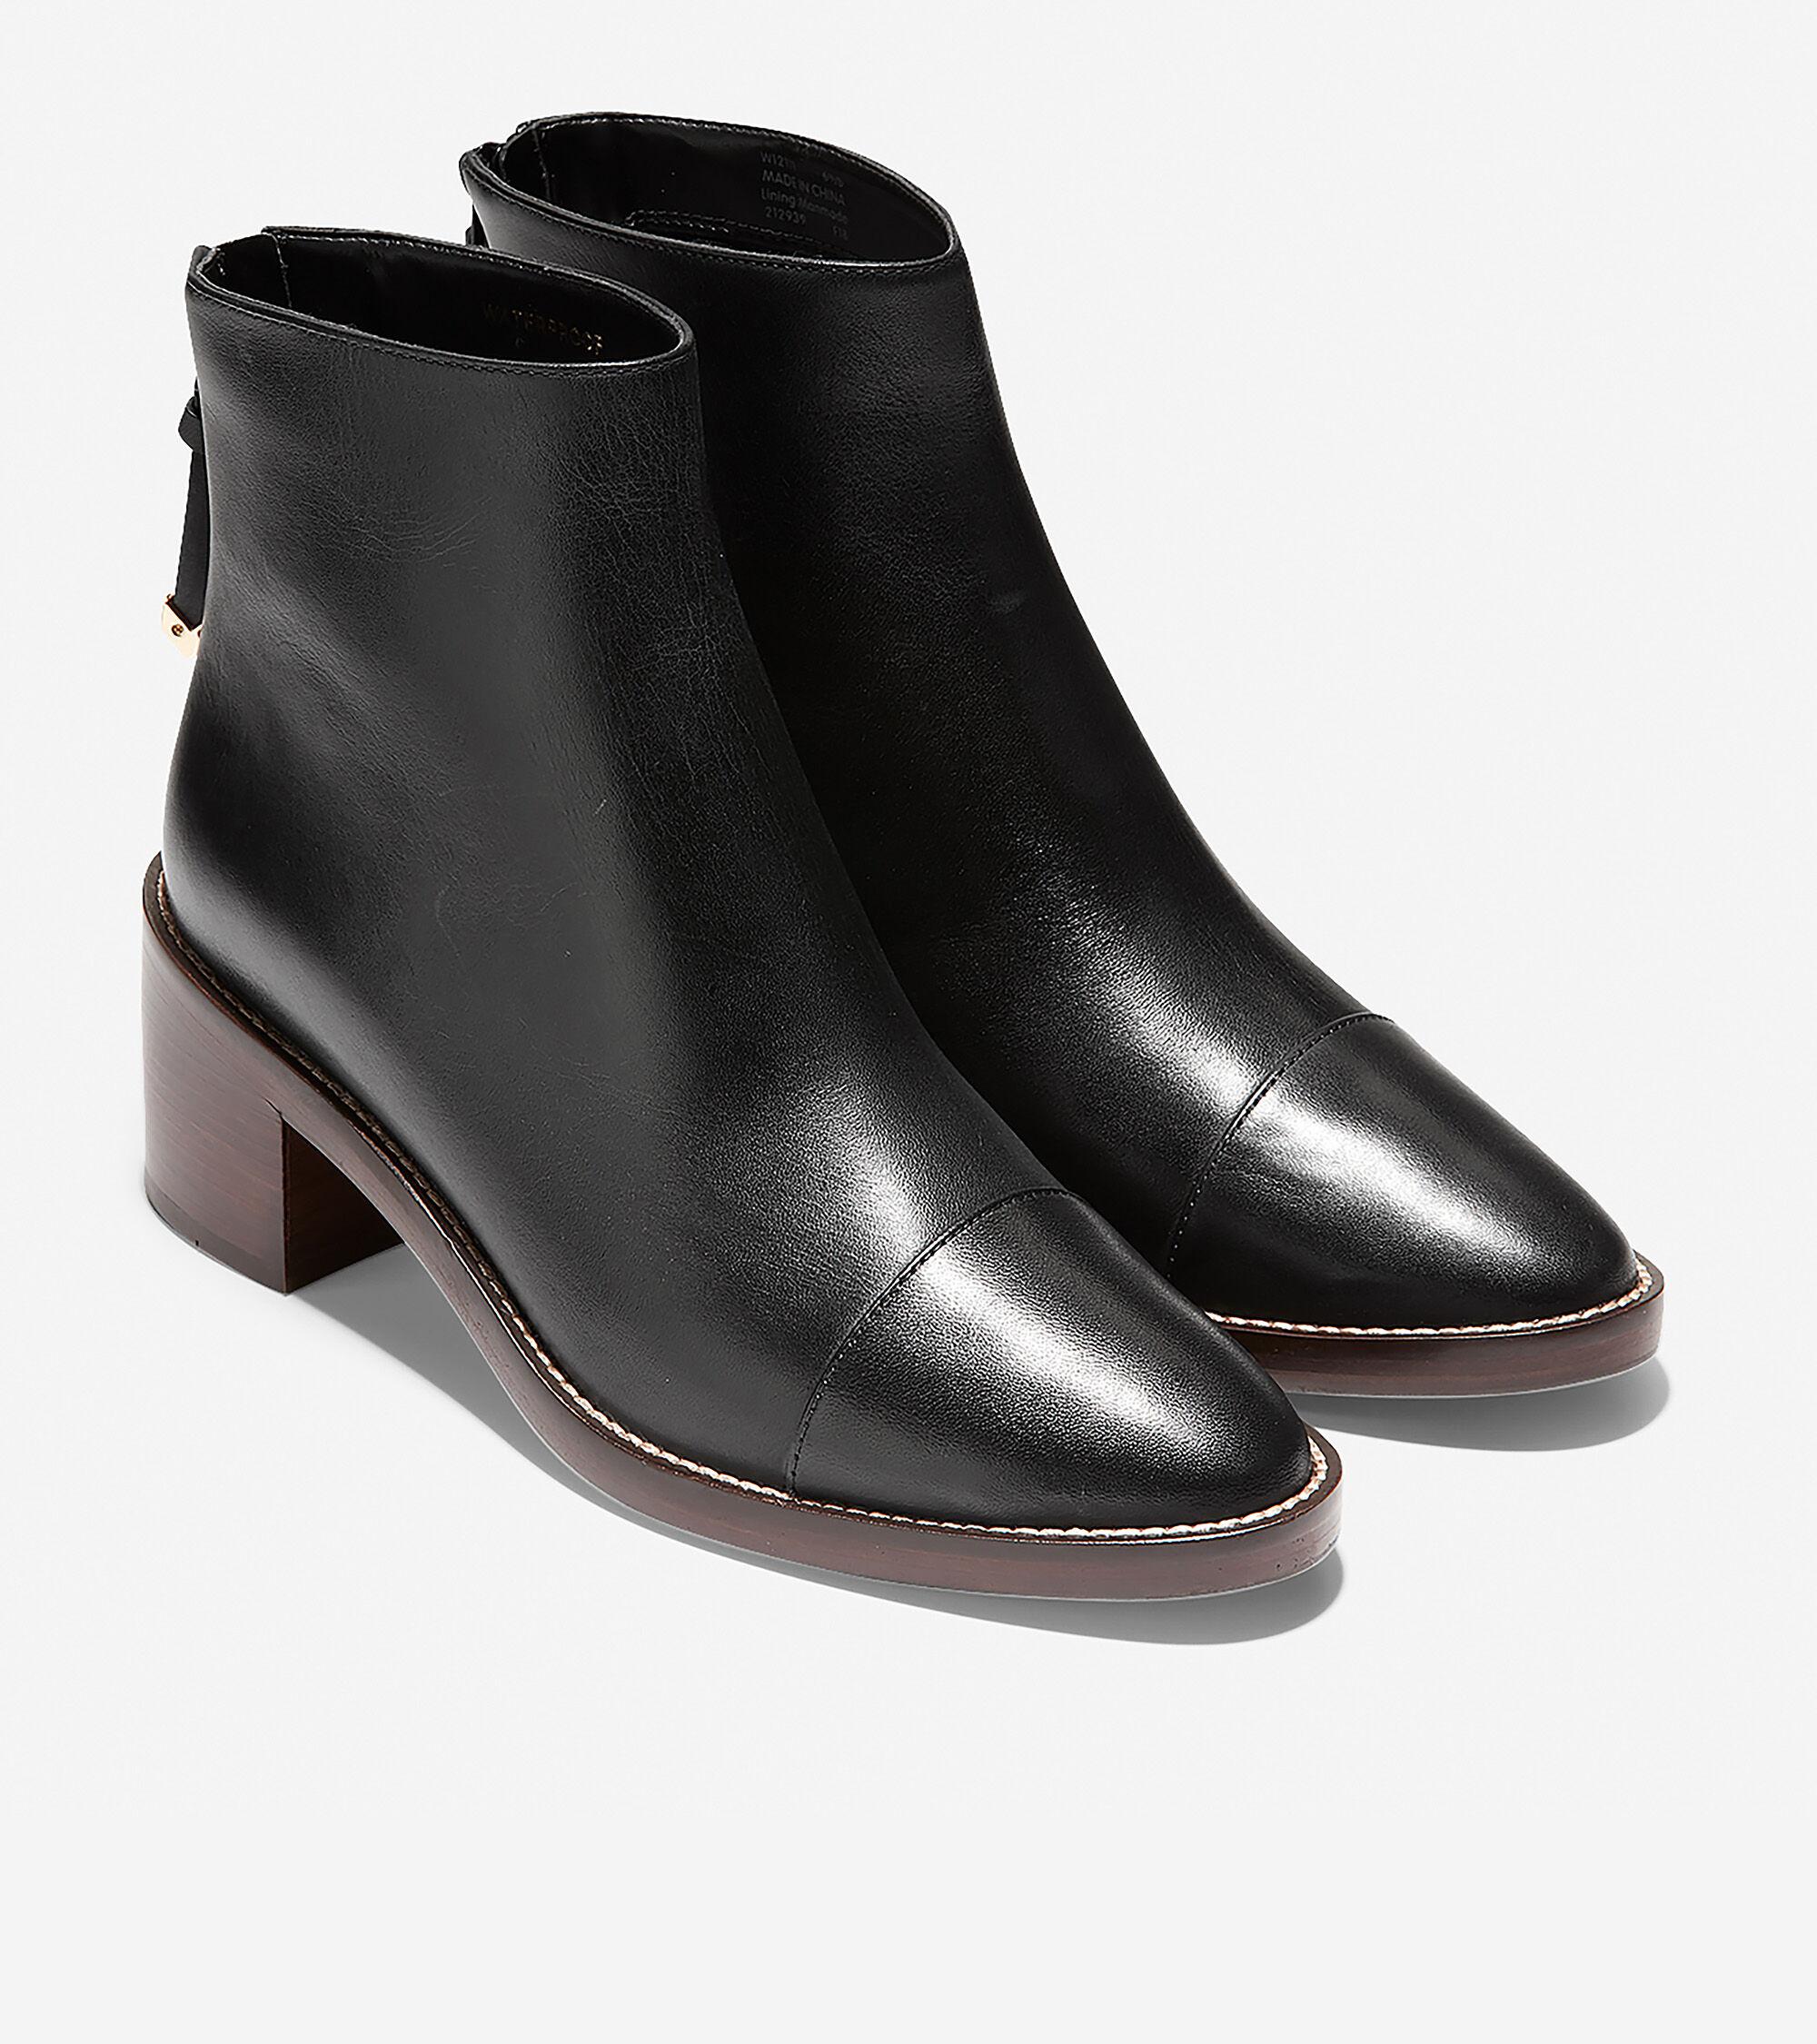 Winnie Grand Bootie in Black Leather